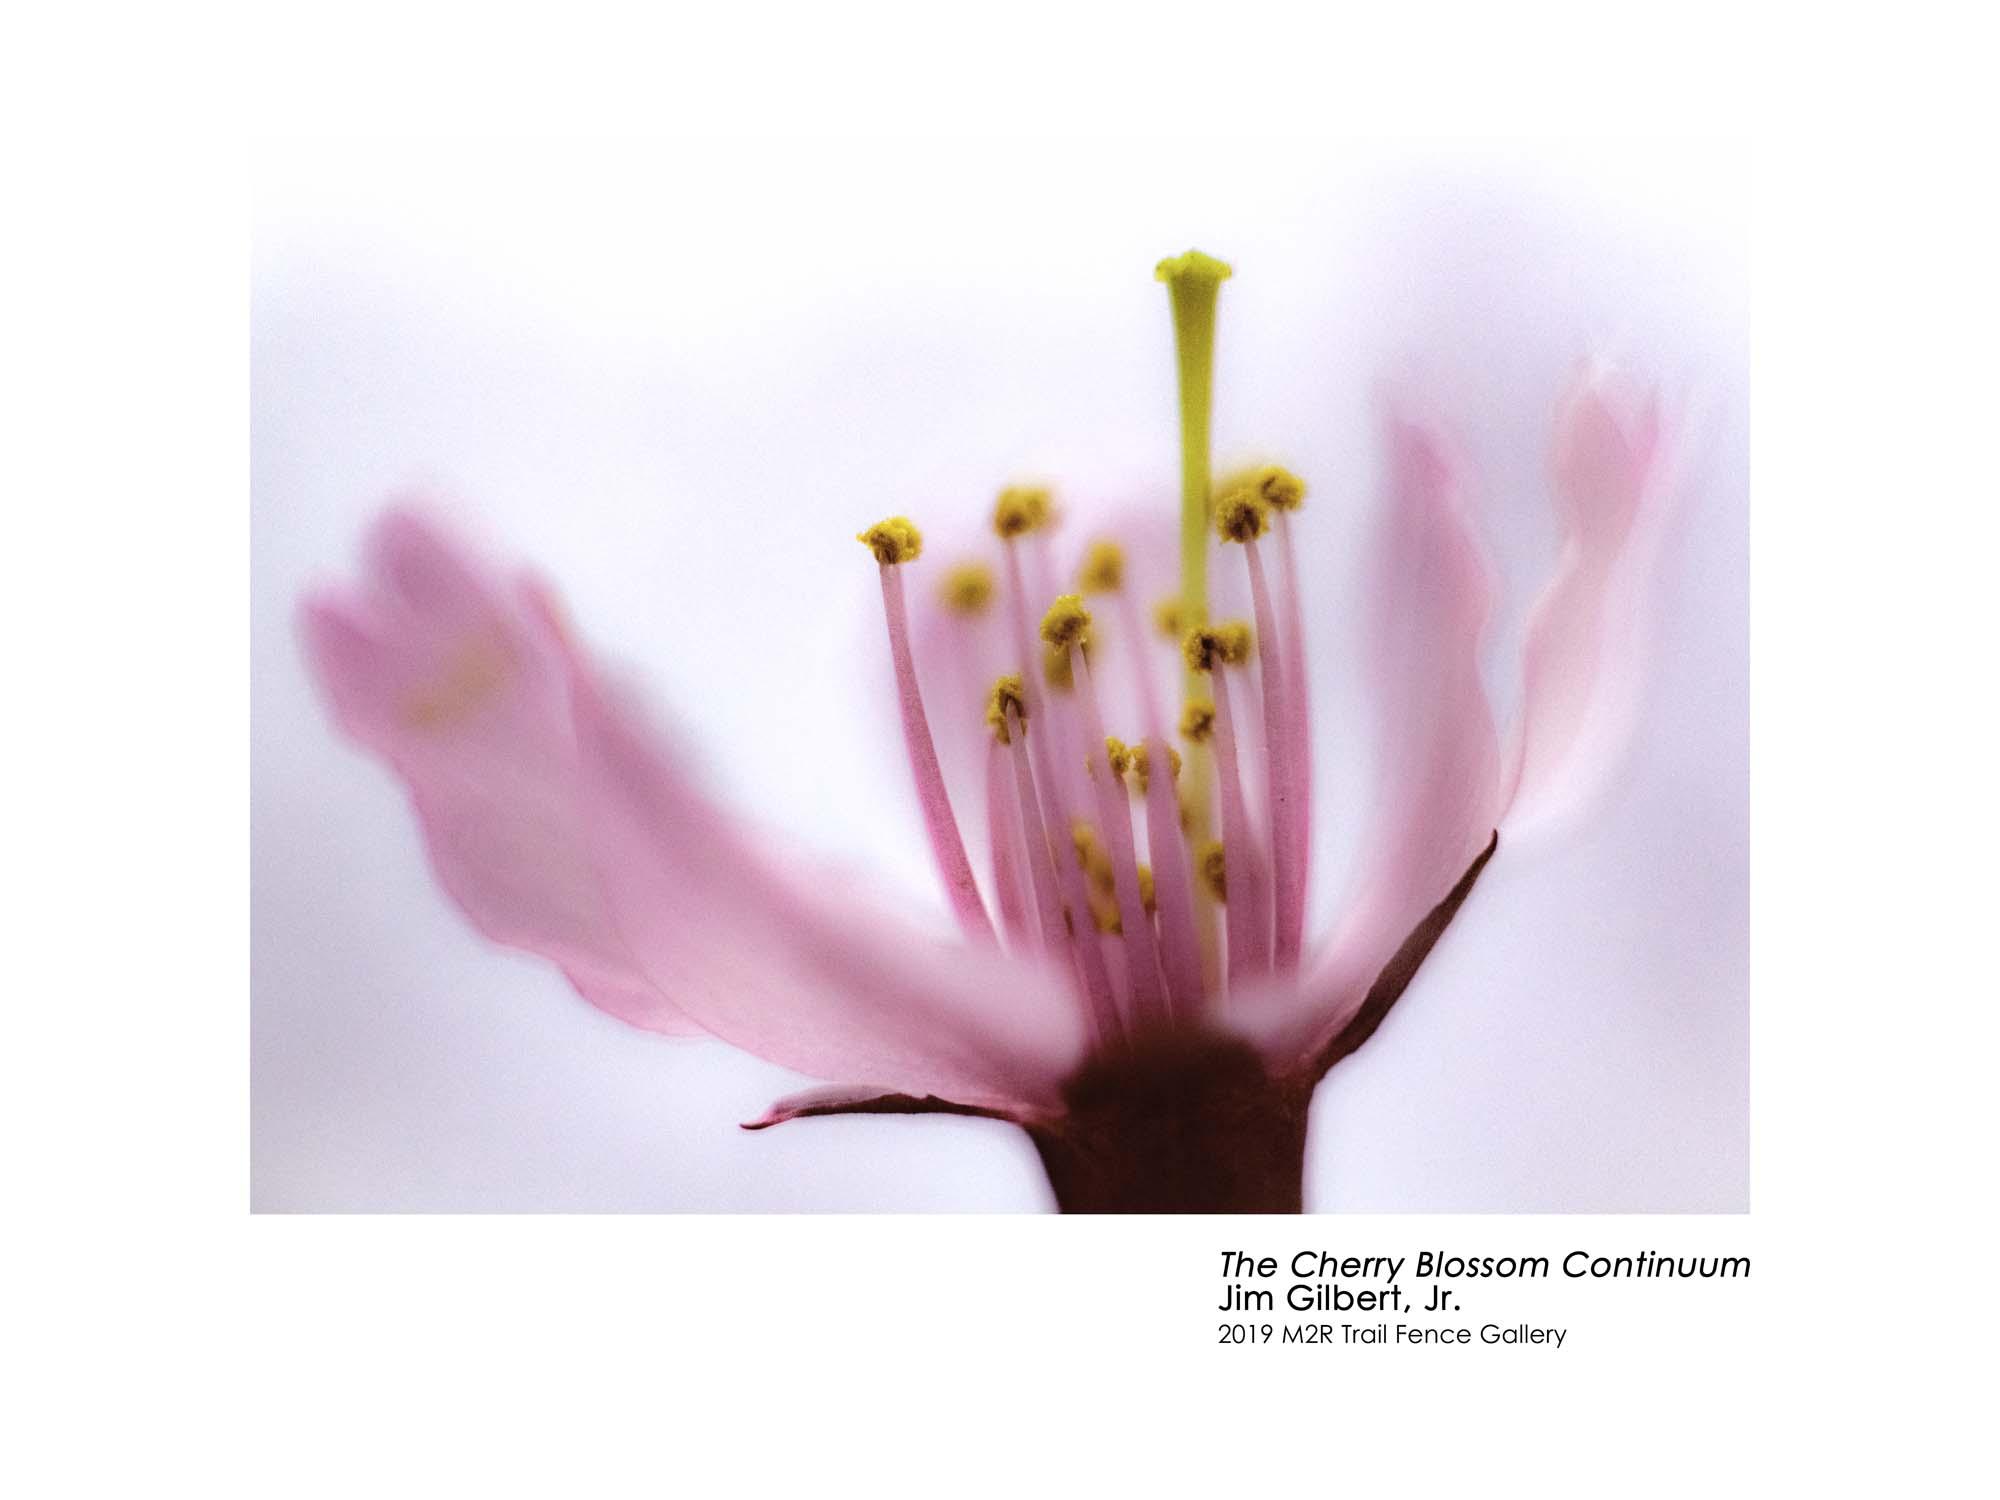 Jim_Gilbert_Jr-The_Cherry_Blossom_Continuum.jpg